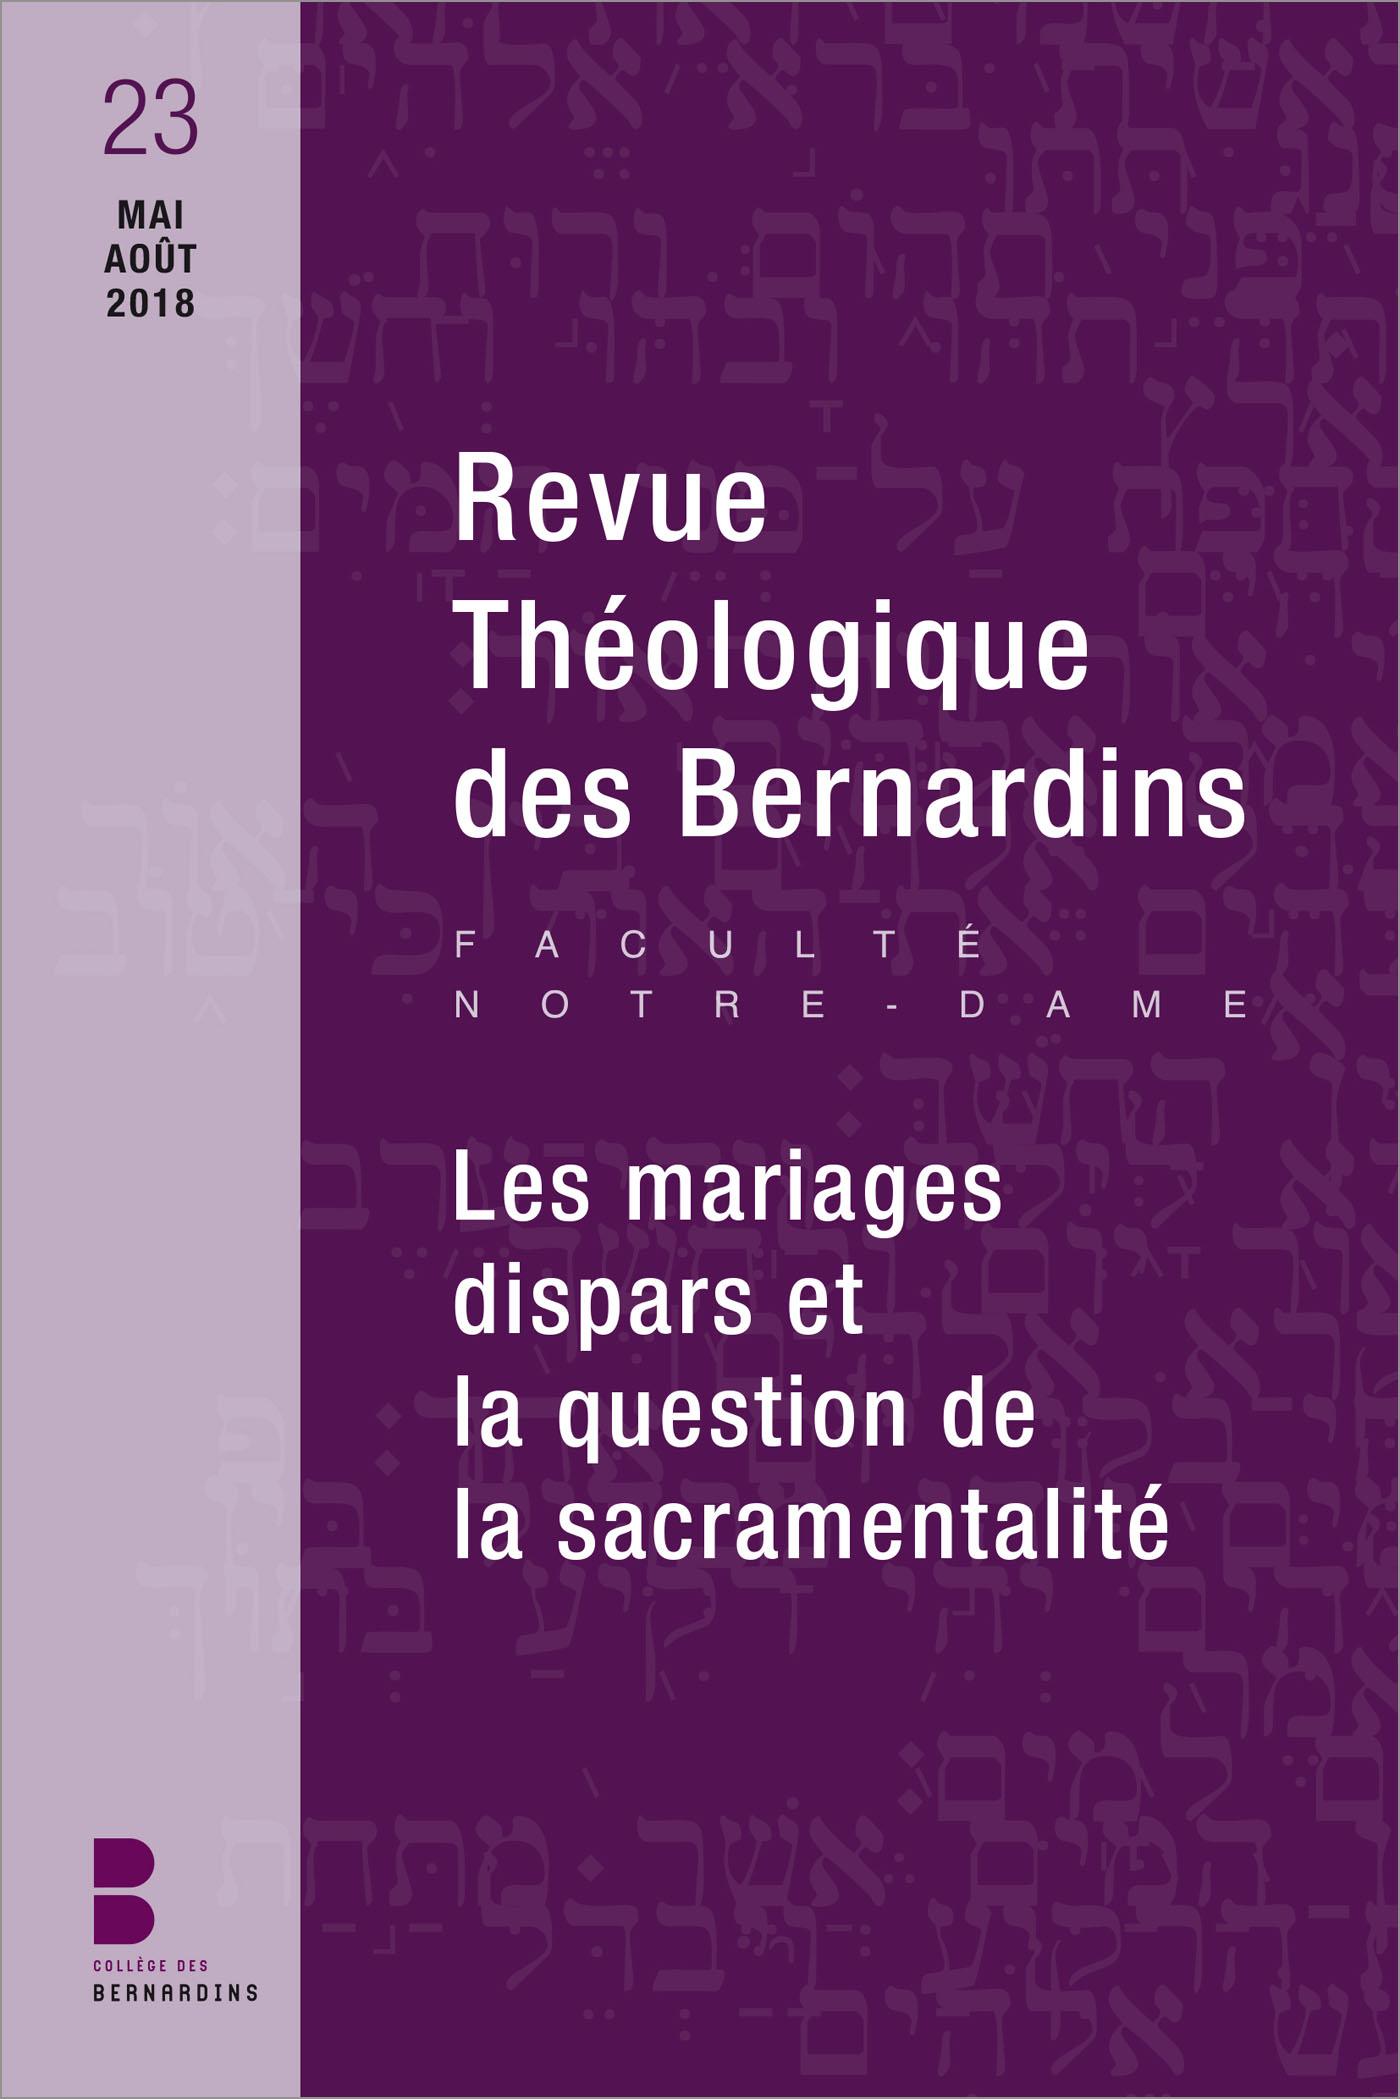 Revue Théologique des Bernardins n°23